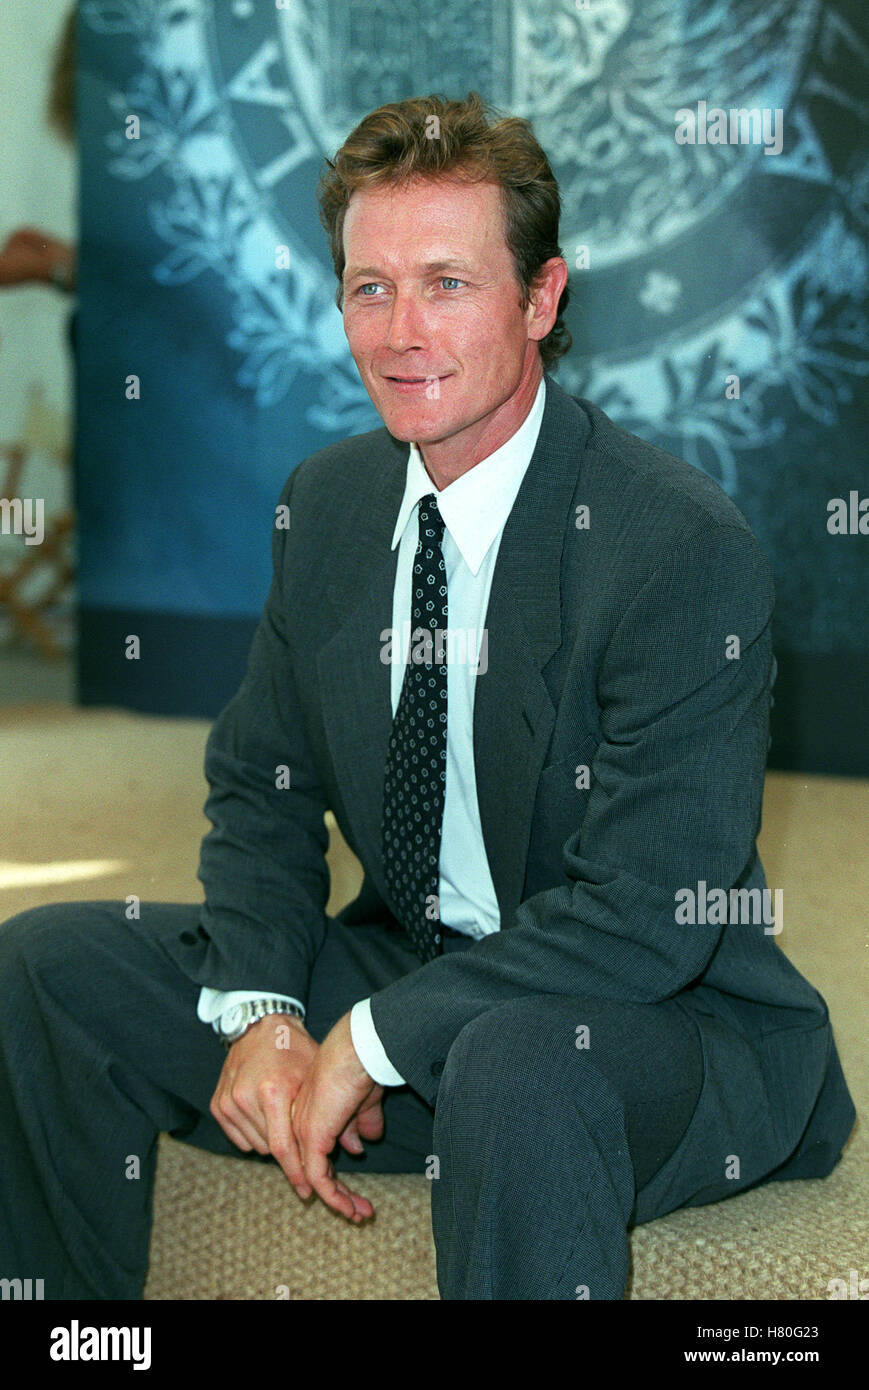 ROBERT PATRICK  12 September 1999 - Stock Image